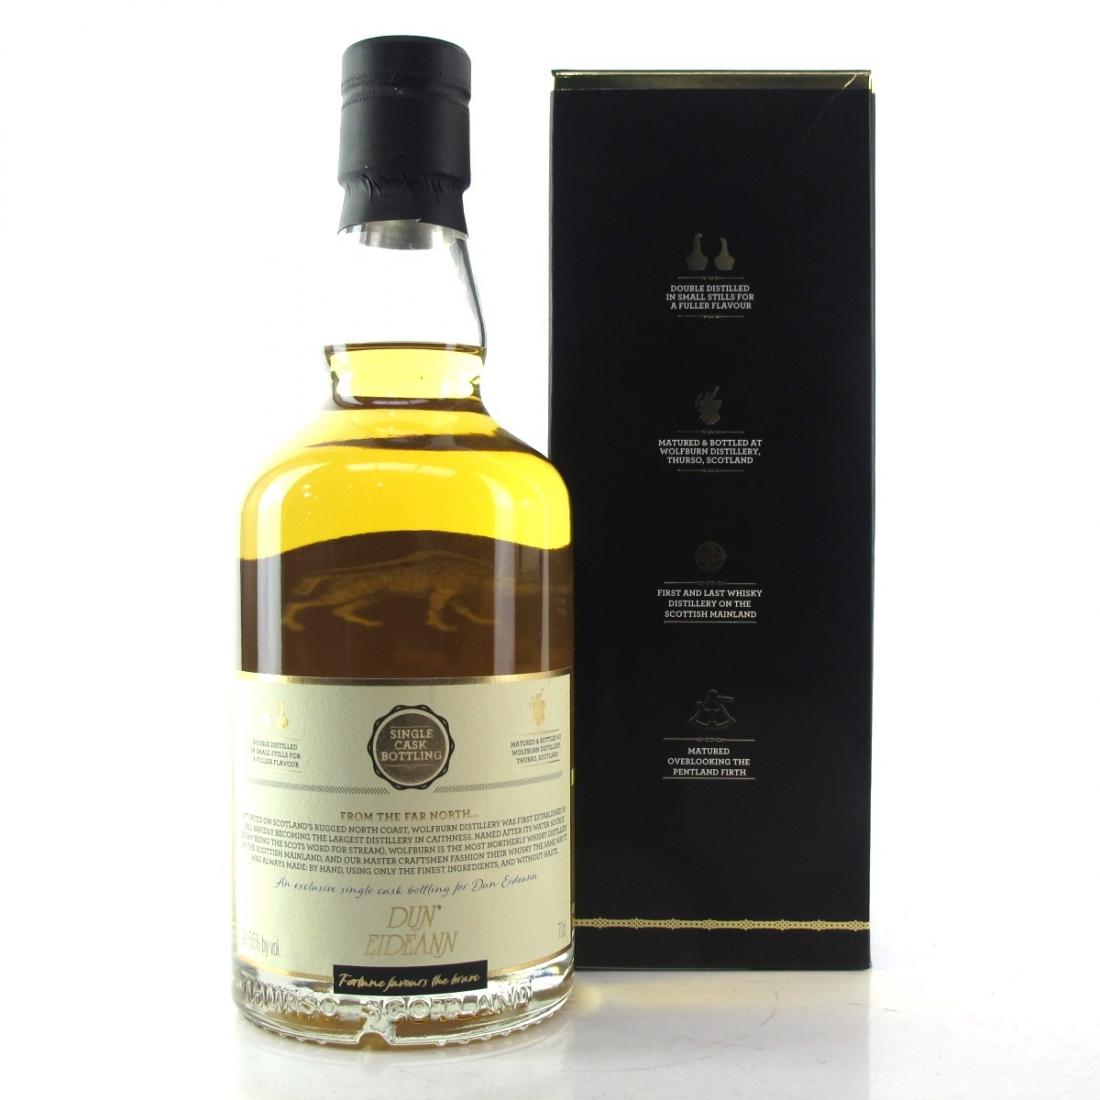 Wolfburn 2014 Private Bottling / Dun Eidann